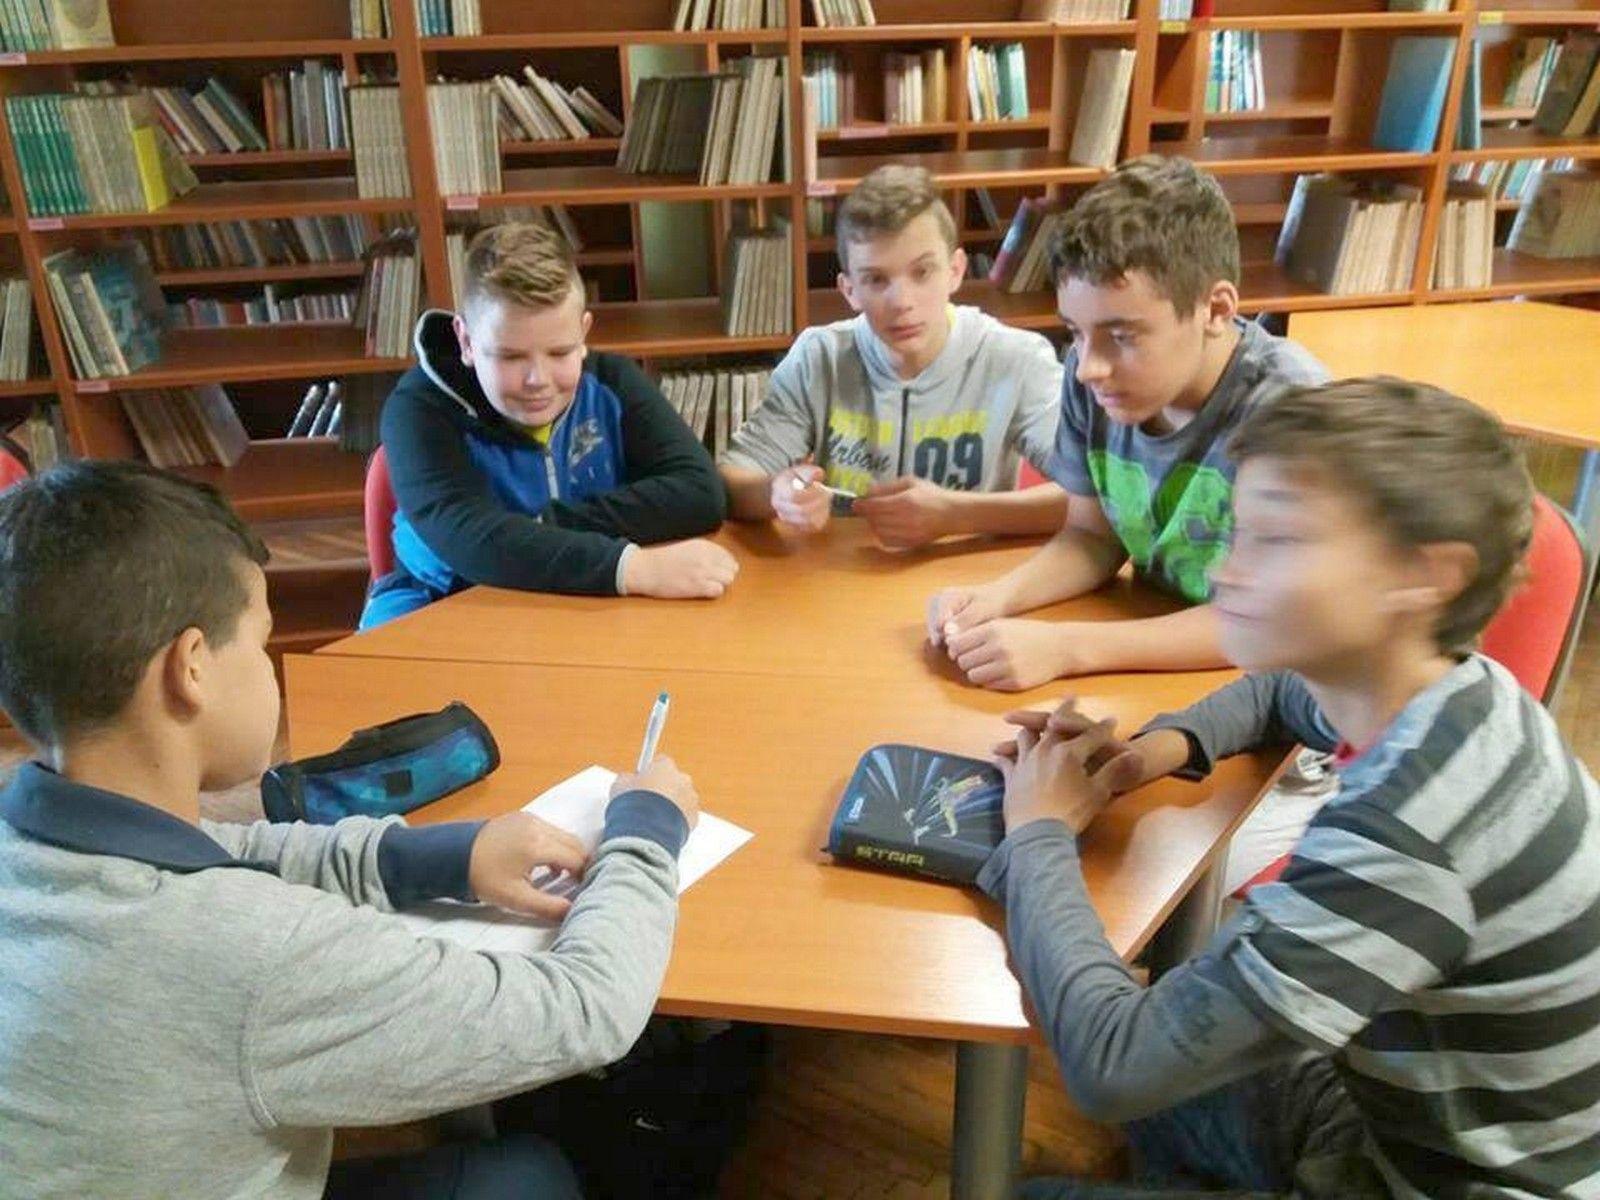 Bjelovarska udruga BUDEM krenula s provedbom programa Bravo za zdravo